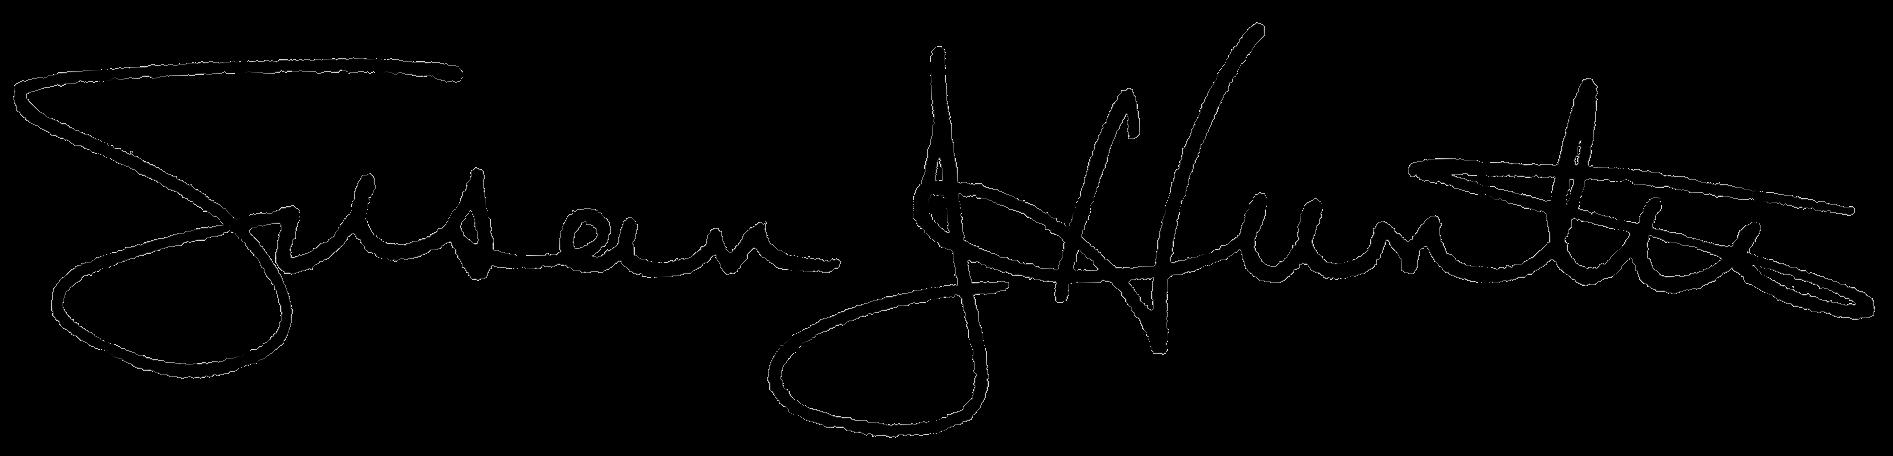 President Hunter signature